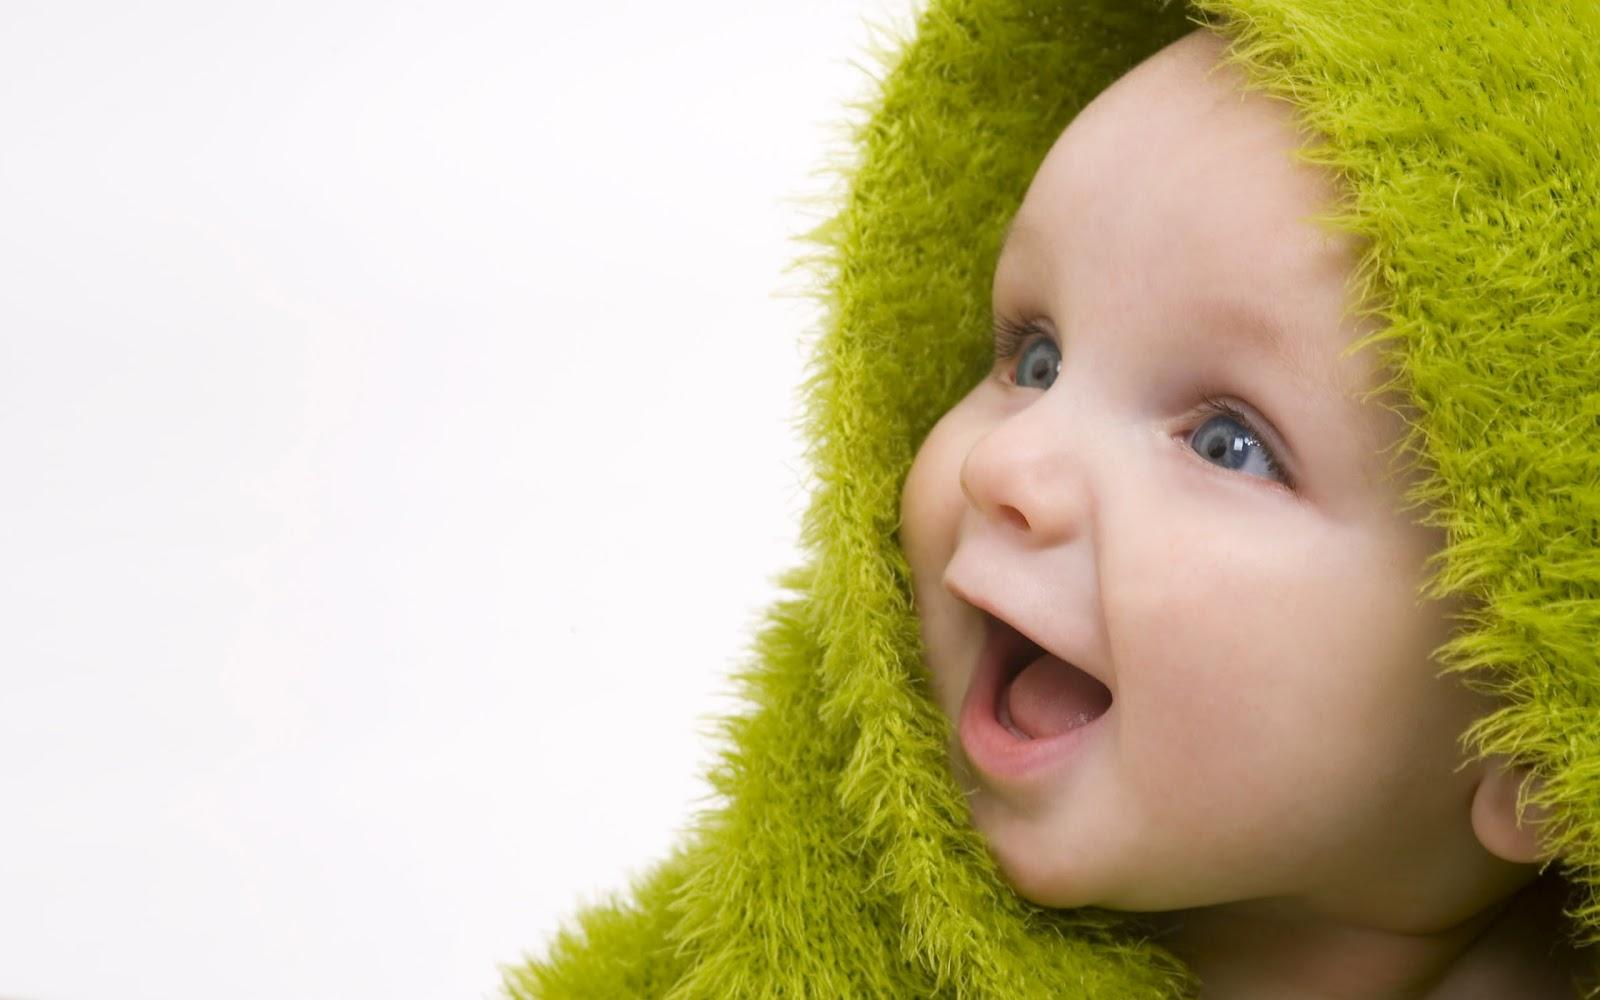 hd bebek resimleri rooteto+%252829%2529 30 En Güzel HD Kalite Bebek Resimleri moda_trend